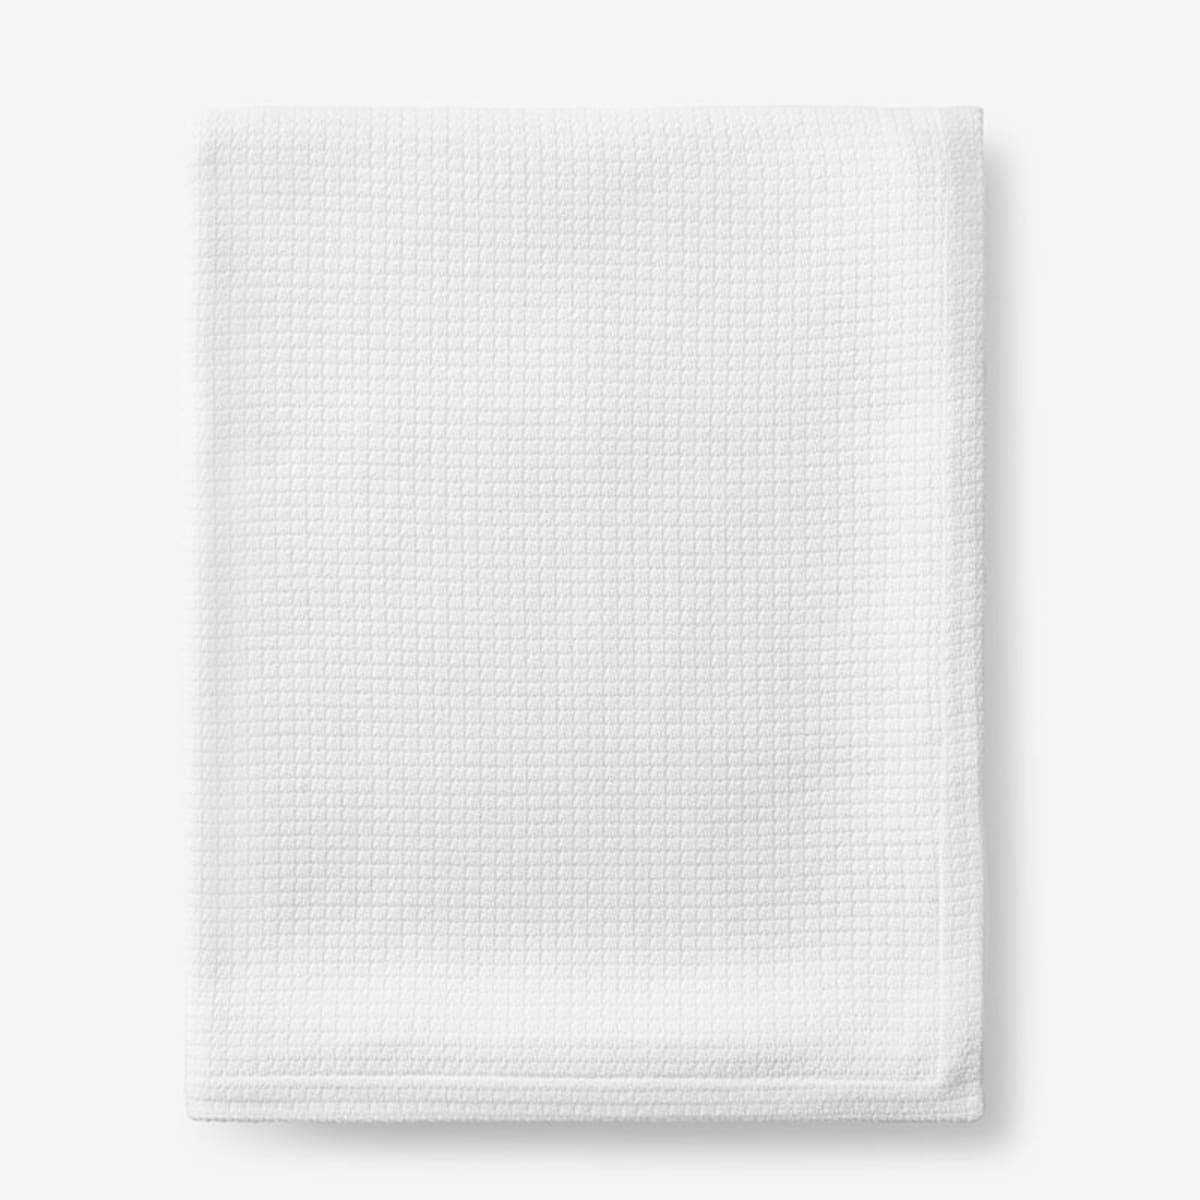 Textured Cotton Weave Blanket